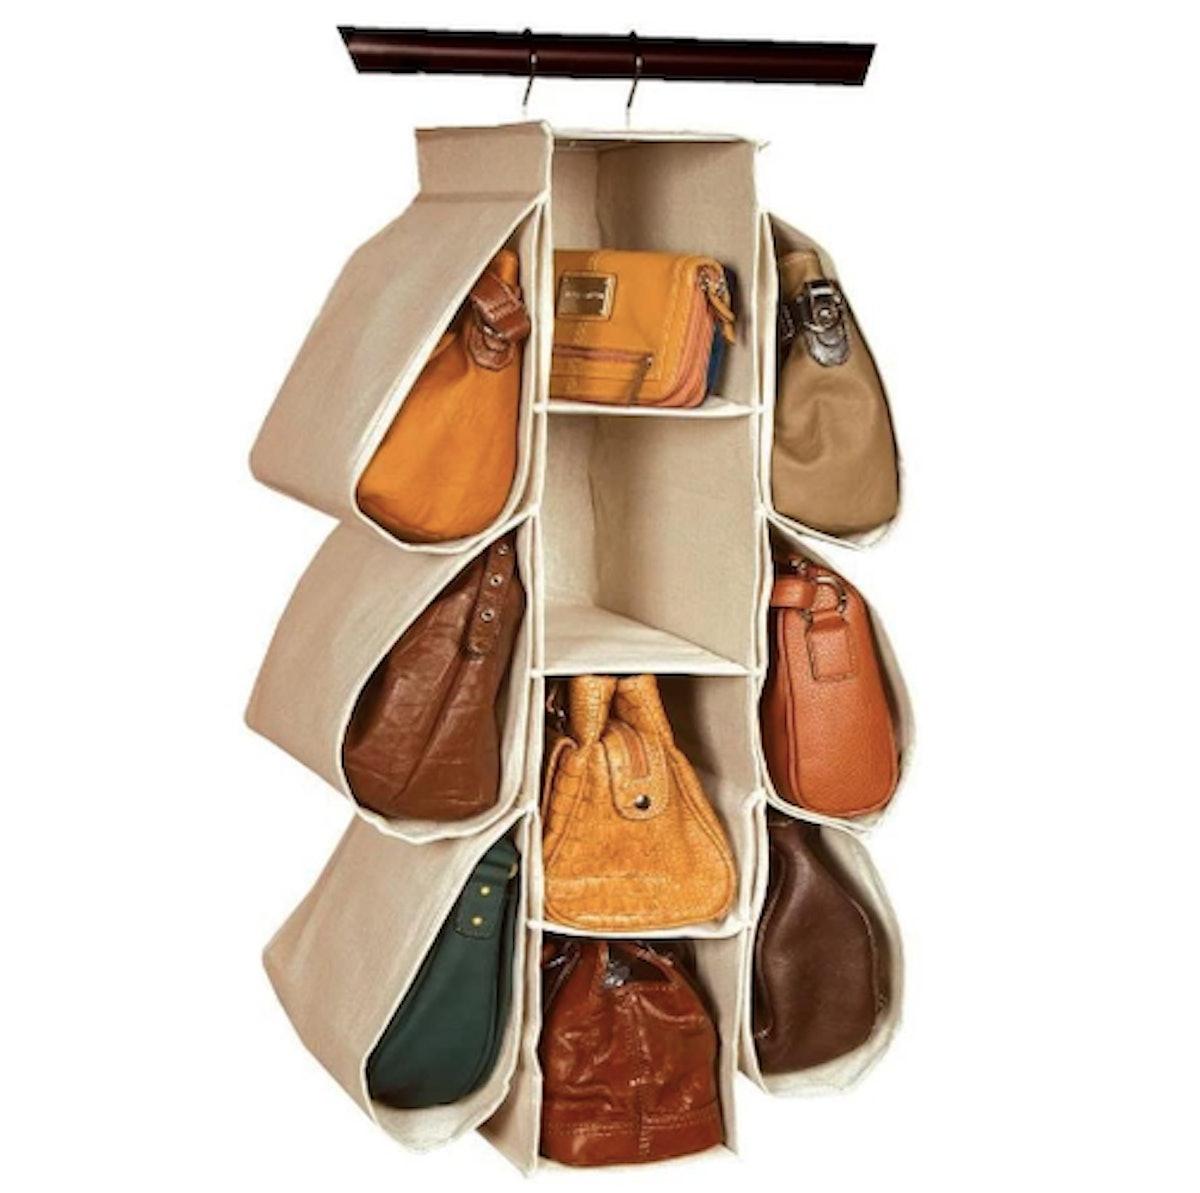 Longteam Hanging Purse Handbag Organizer